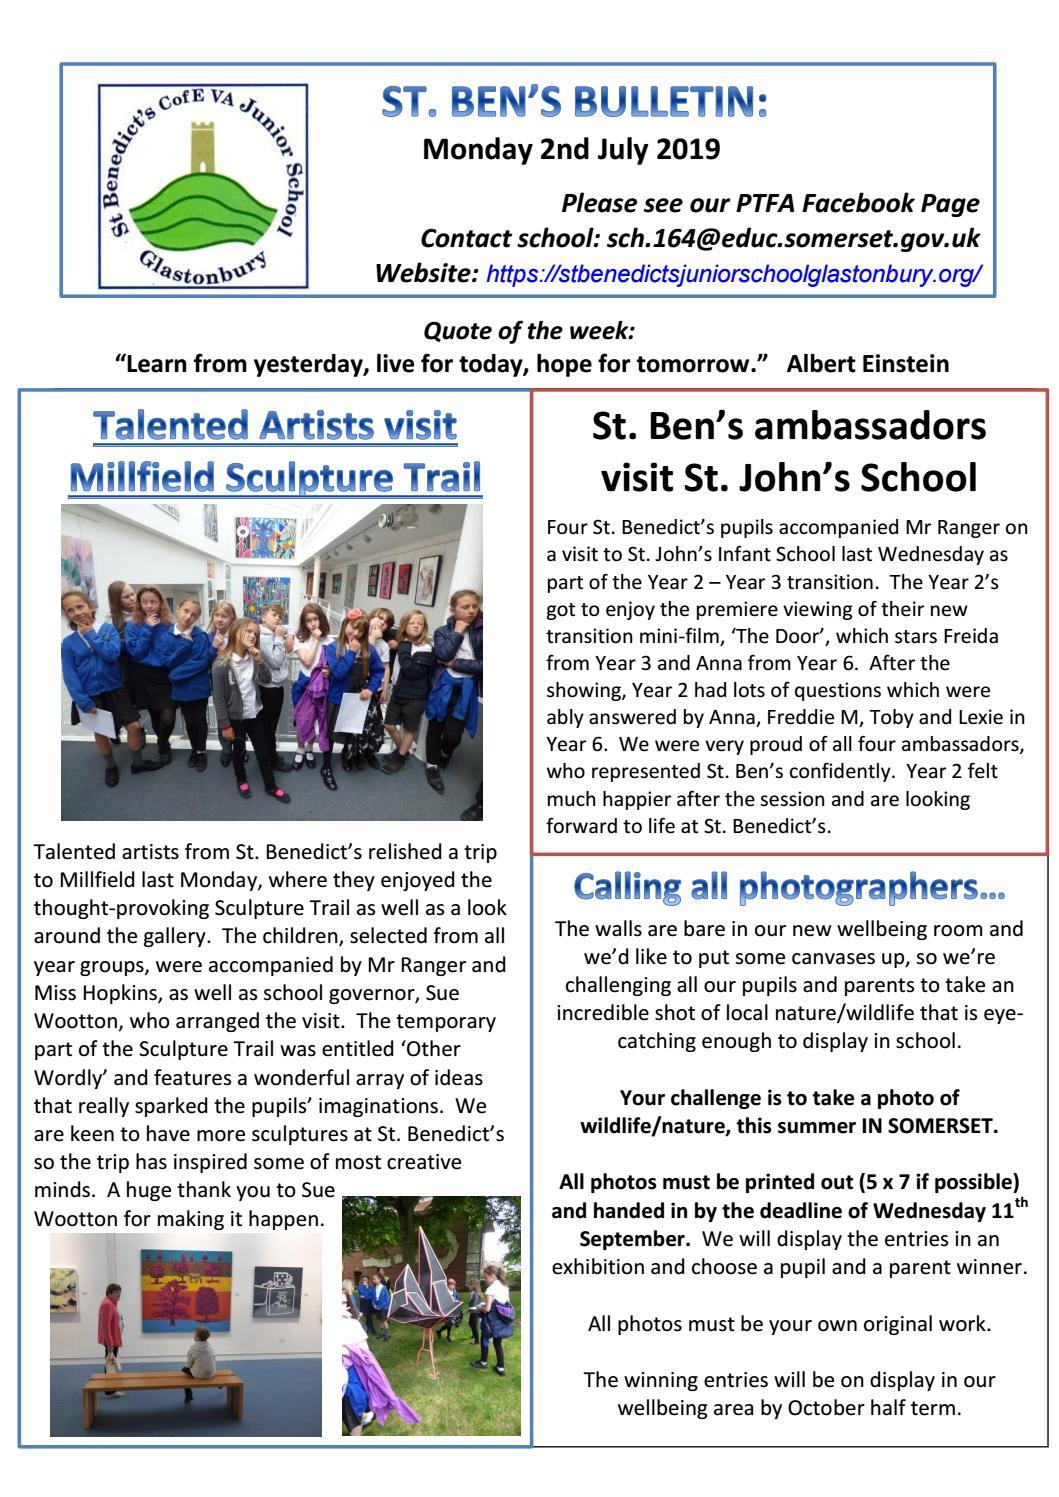 2nd july 2019 st bens newsletter by Edgar Danmer - issuu